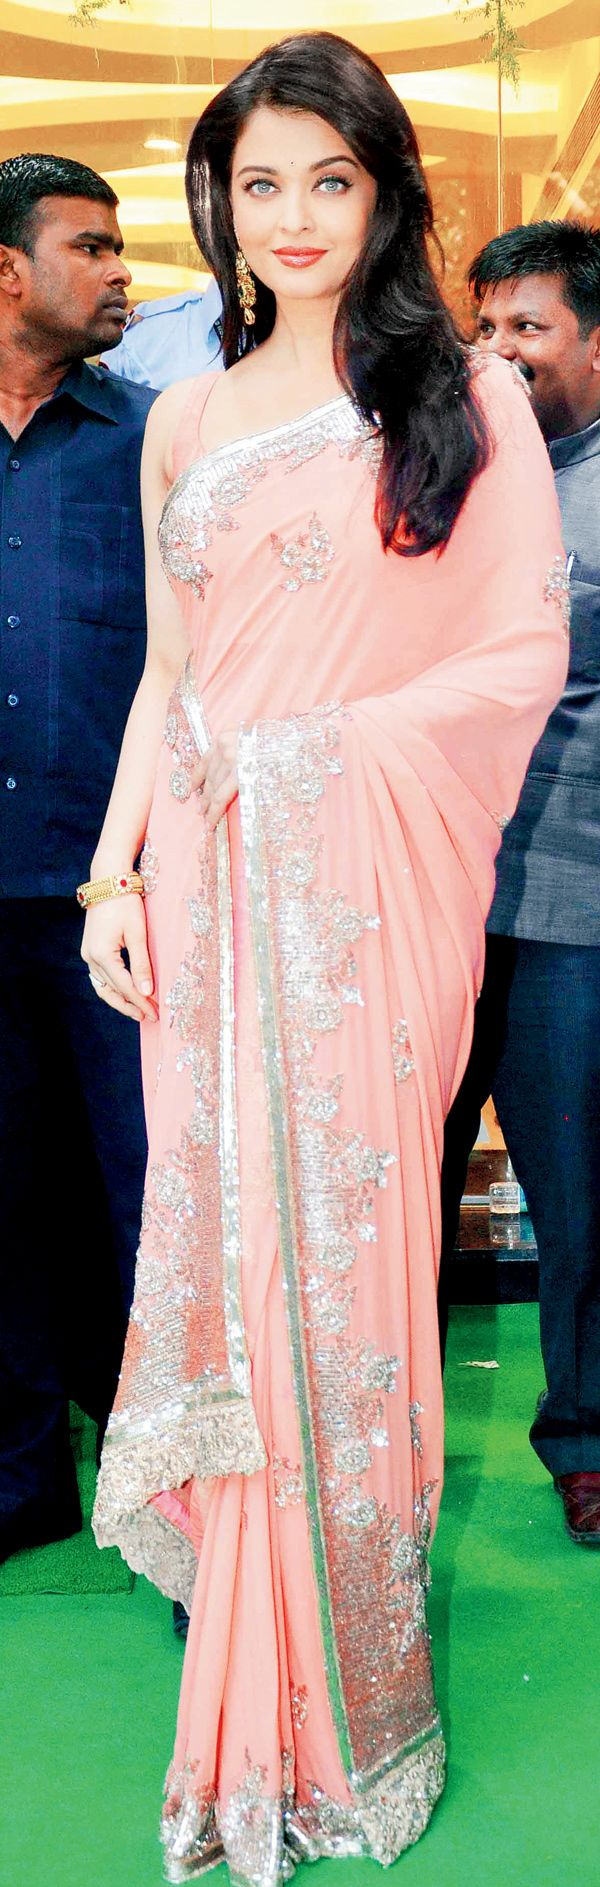 Aishwarya Rai Bachchan at Kalyan Jewellers store launch in Mumbai. #Bollywood #Fashion #Style #Beauty